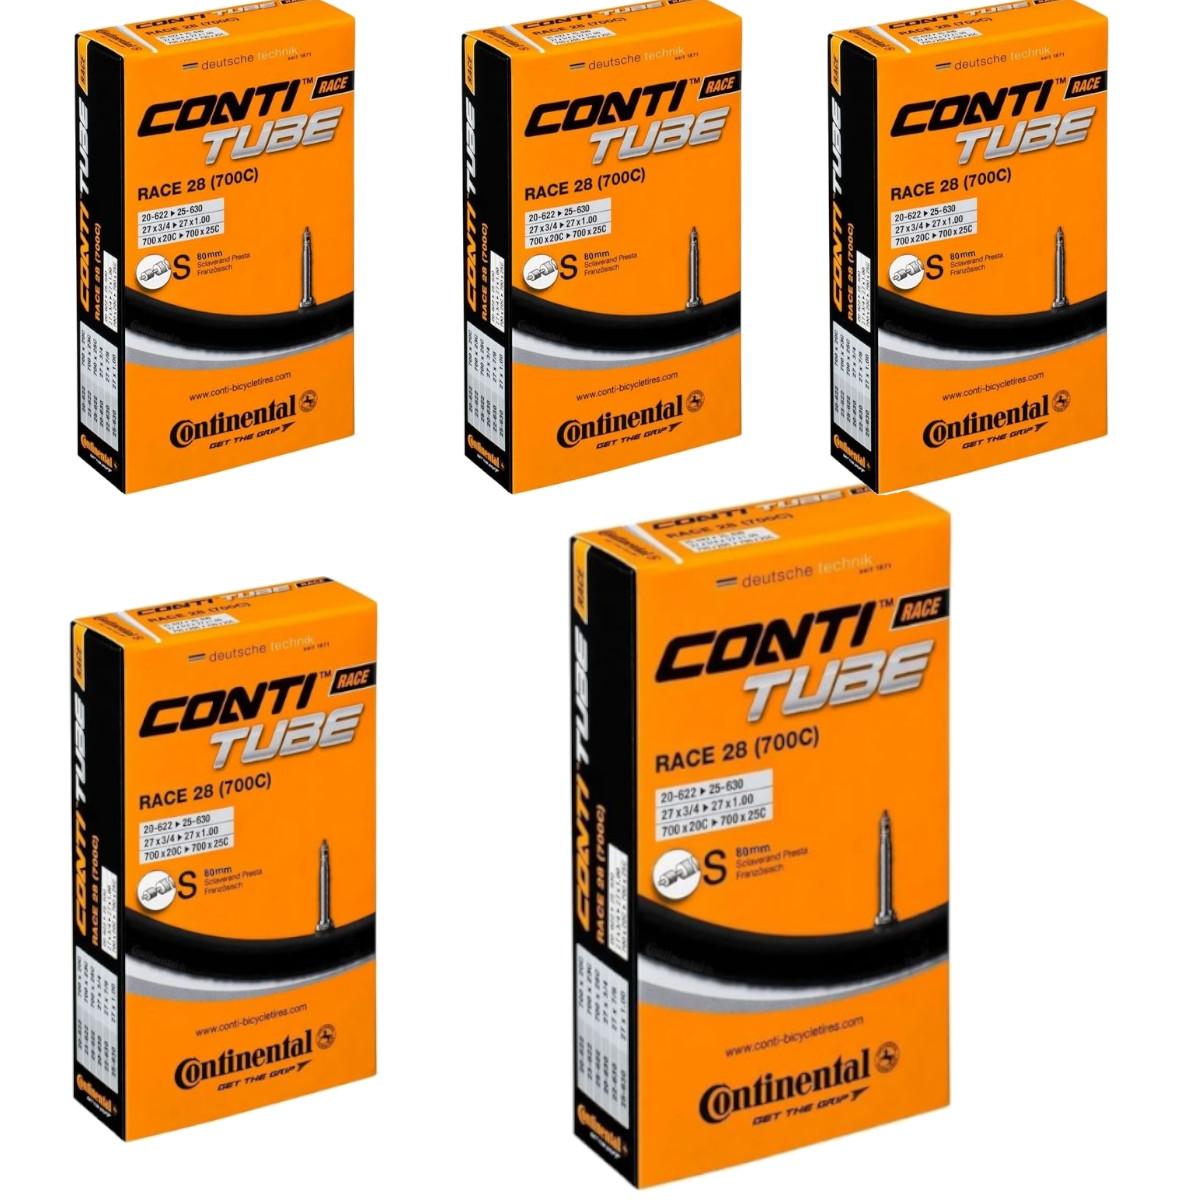 Kit 5 Câmaras Ar Speed Continental Race 700 18-25 Valv 80mm